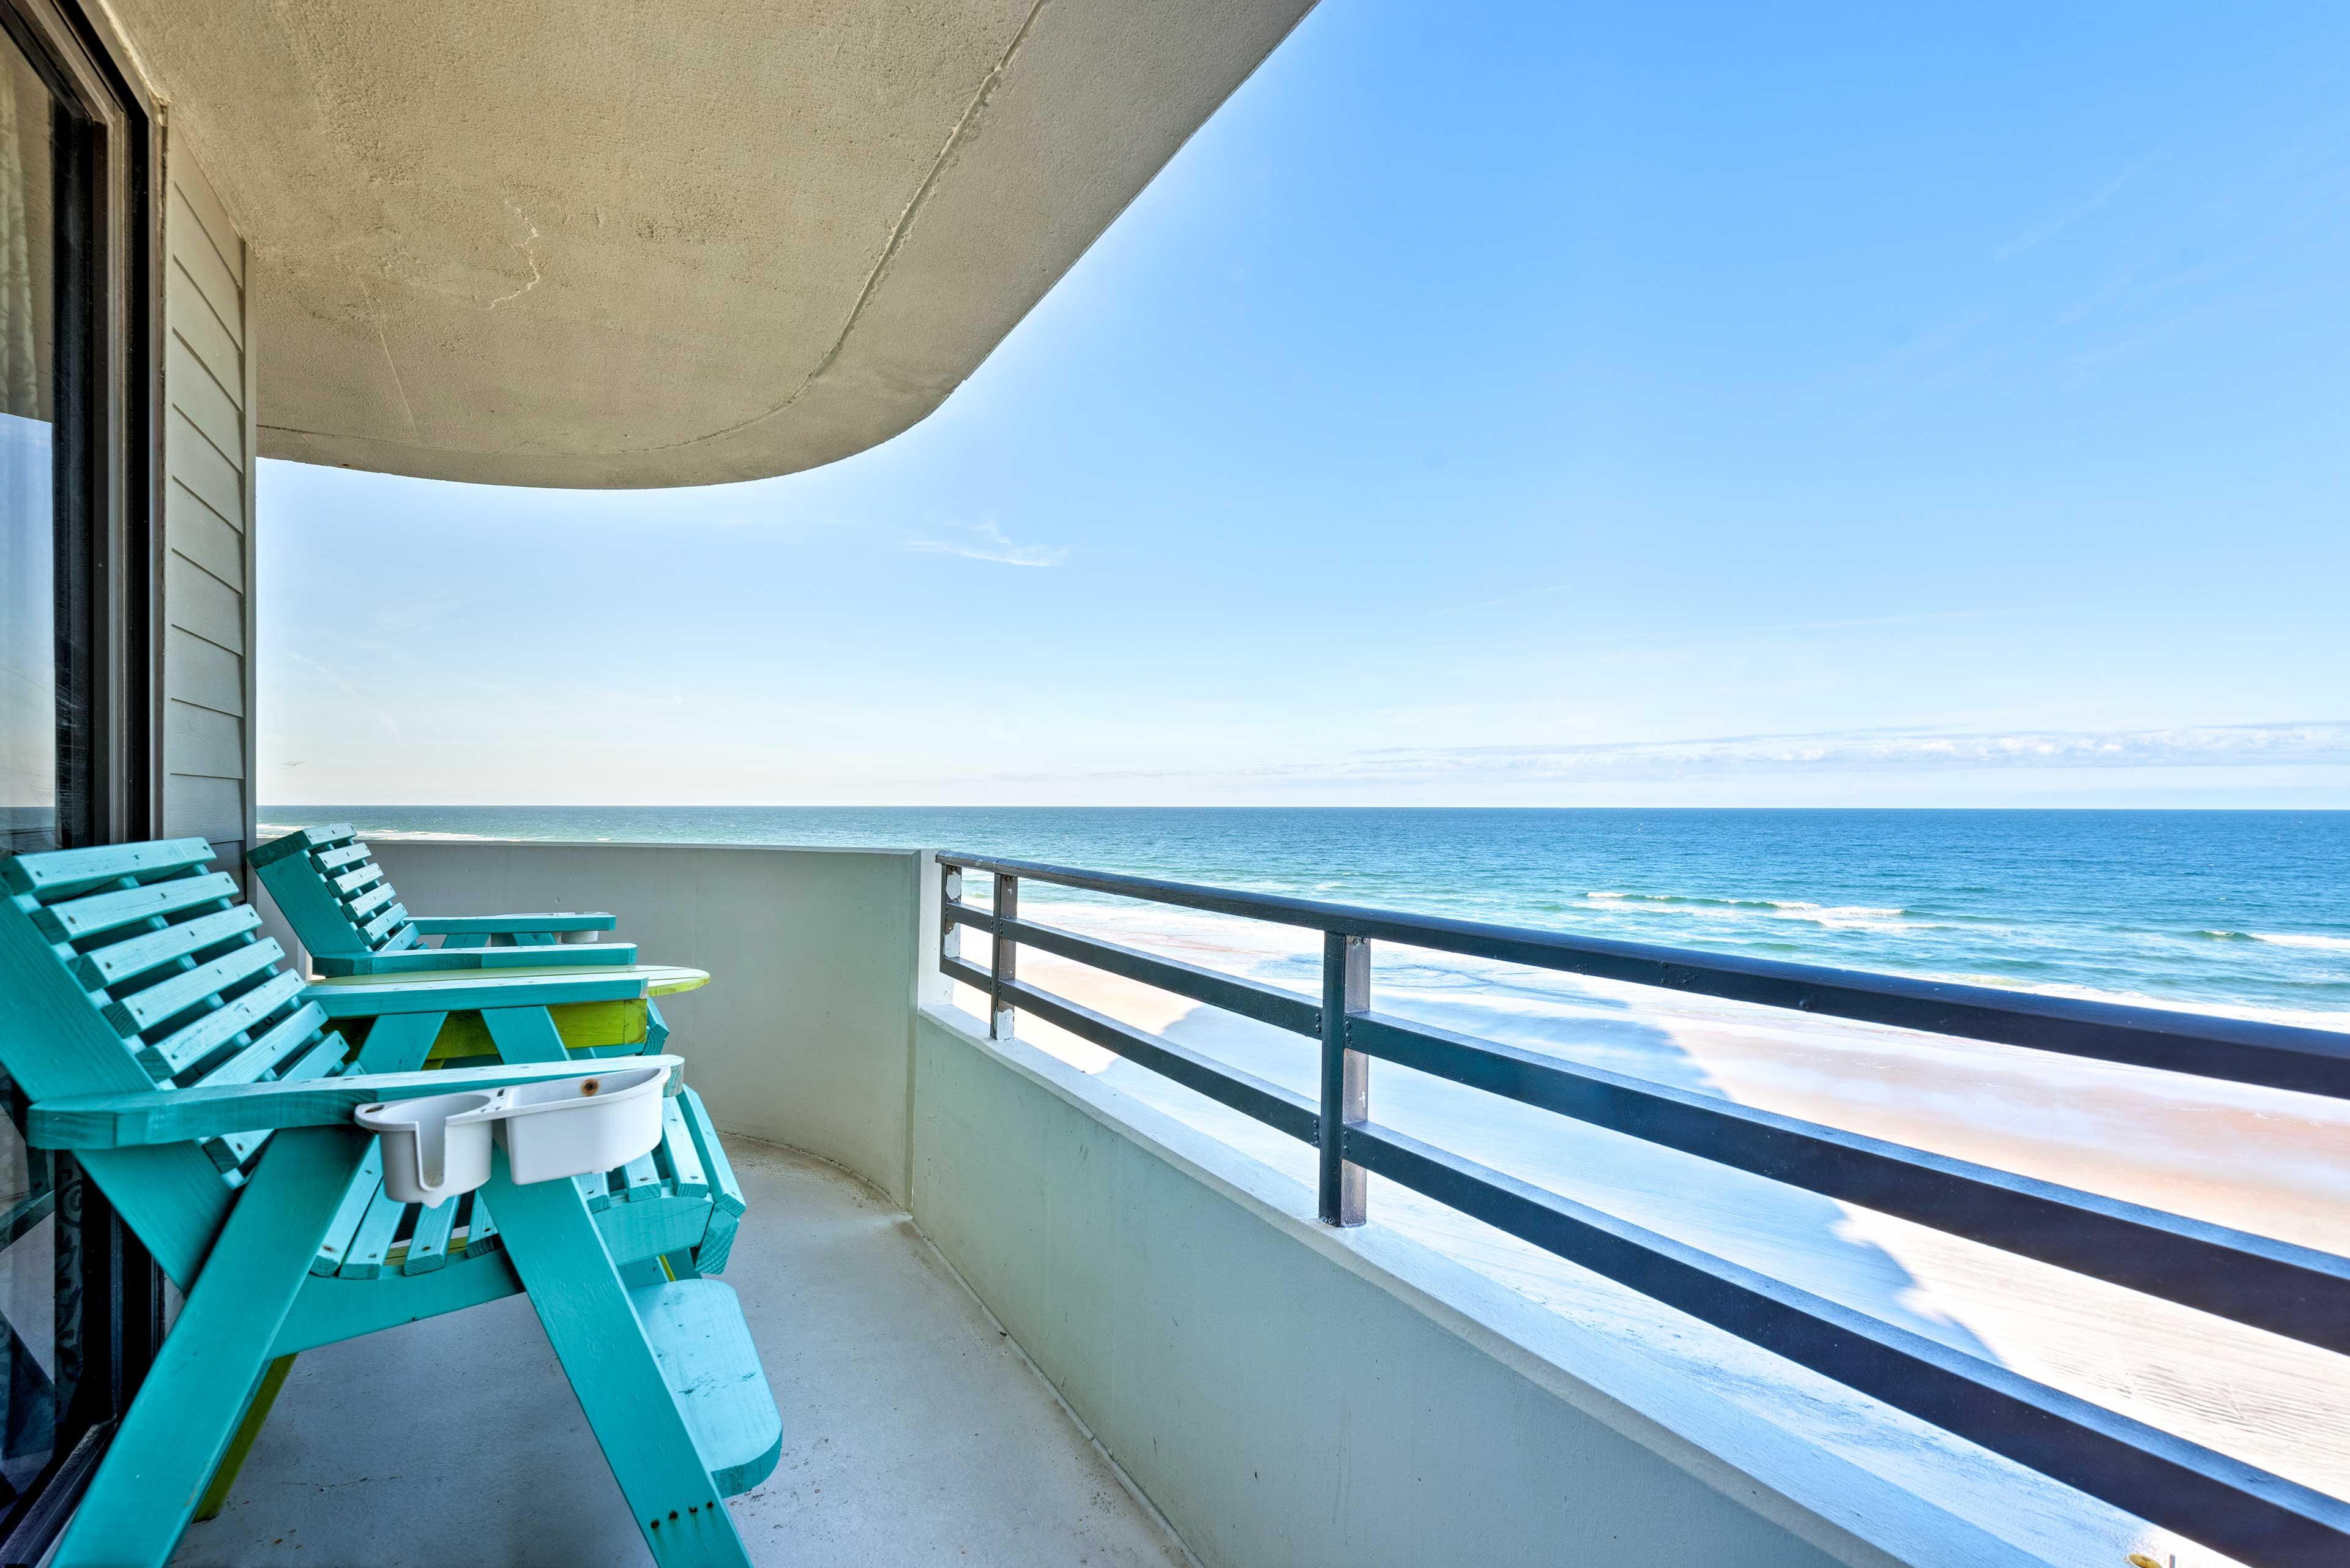 Your relaxing Daytona Beach getaway awaits at this 2-BR, 2-BA vacation rental.